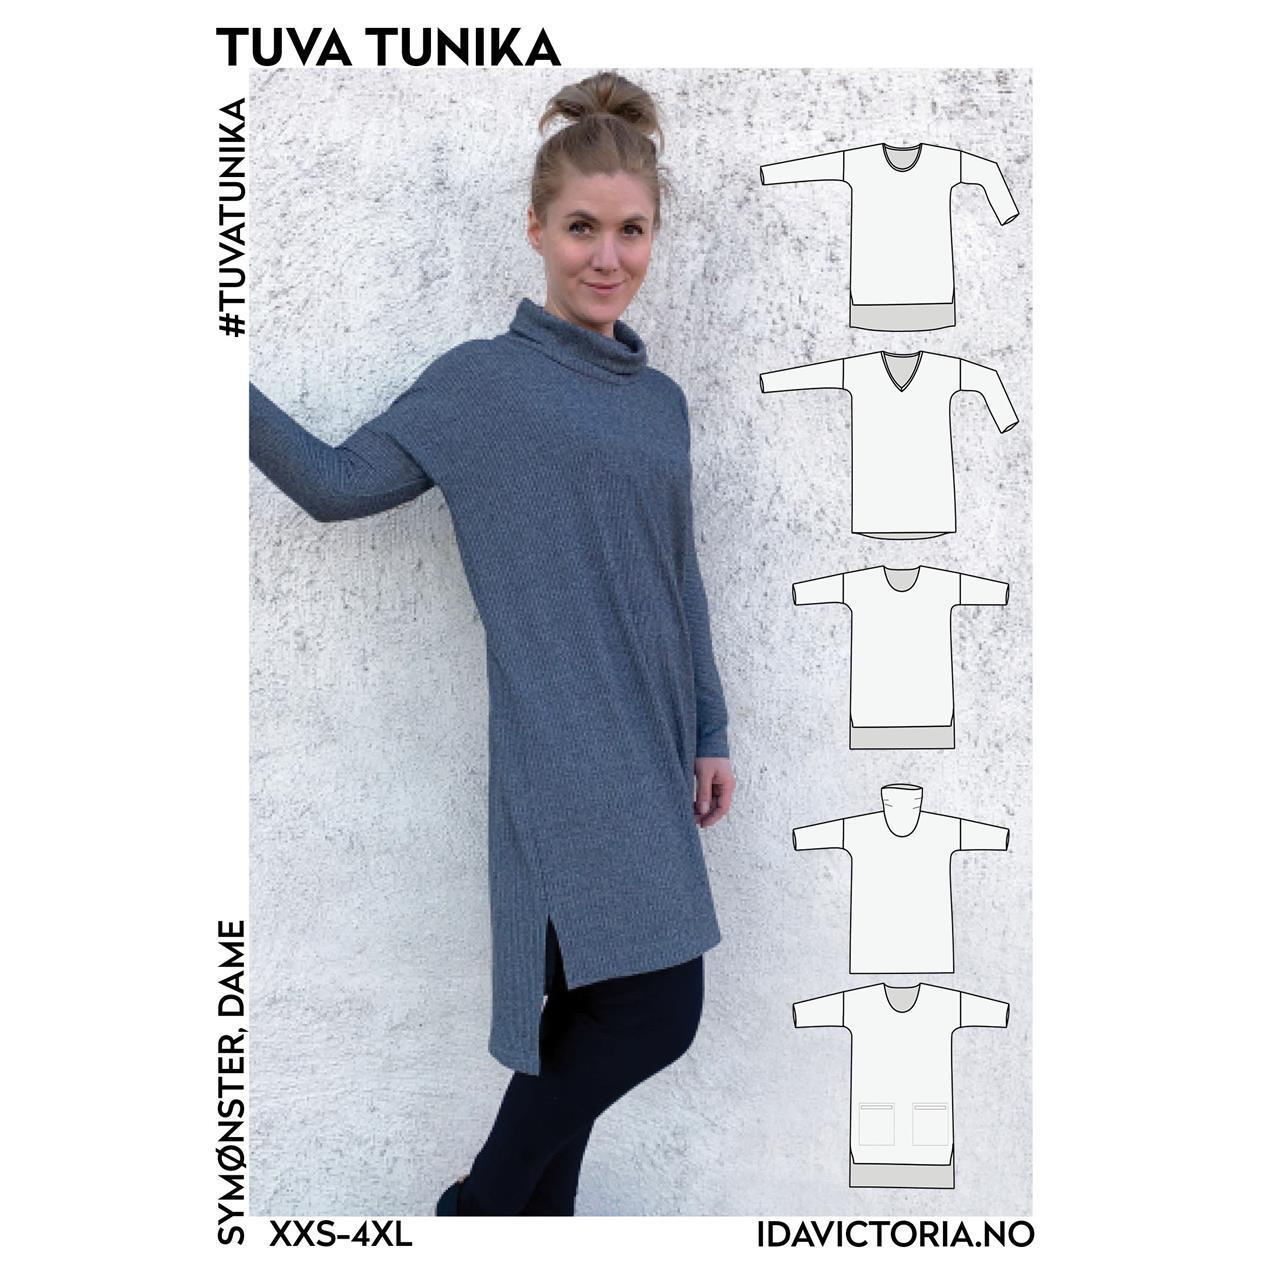 Tuva Tunika